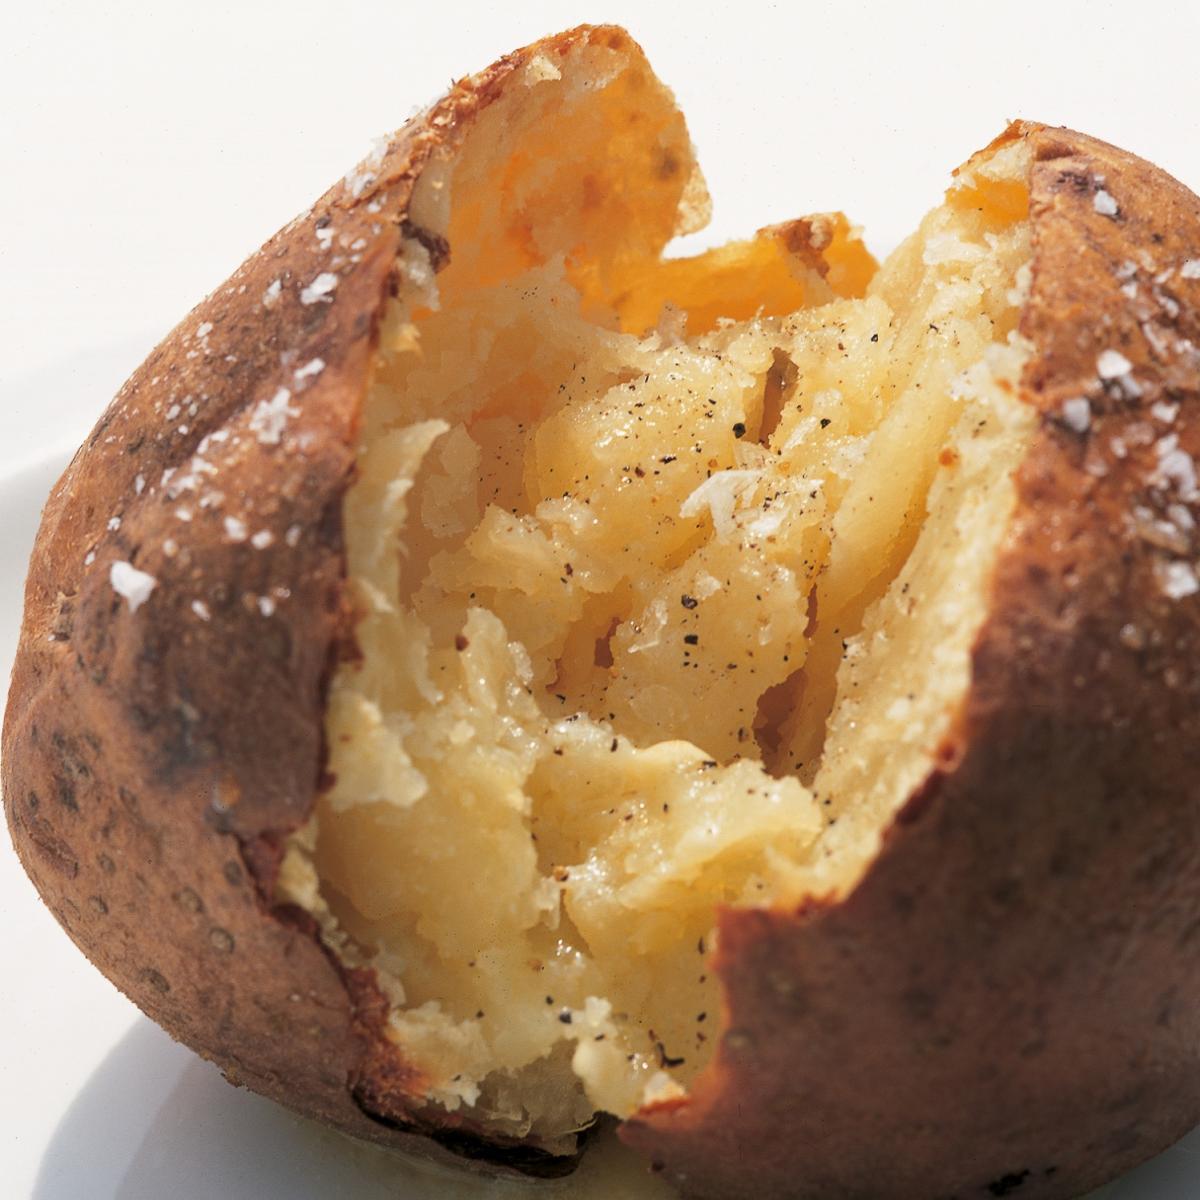 Jacket potatoes recipes delia online a picture of delias souffled jacket potatoes recipe ccuart Choice Image